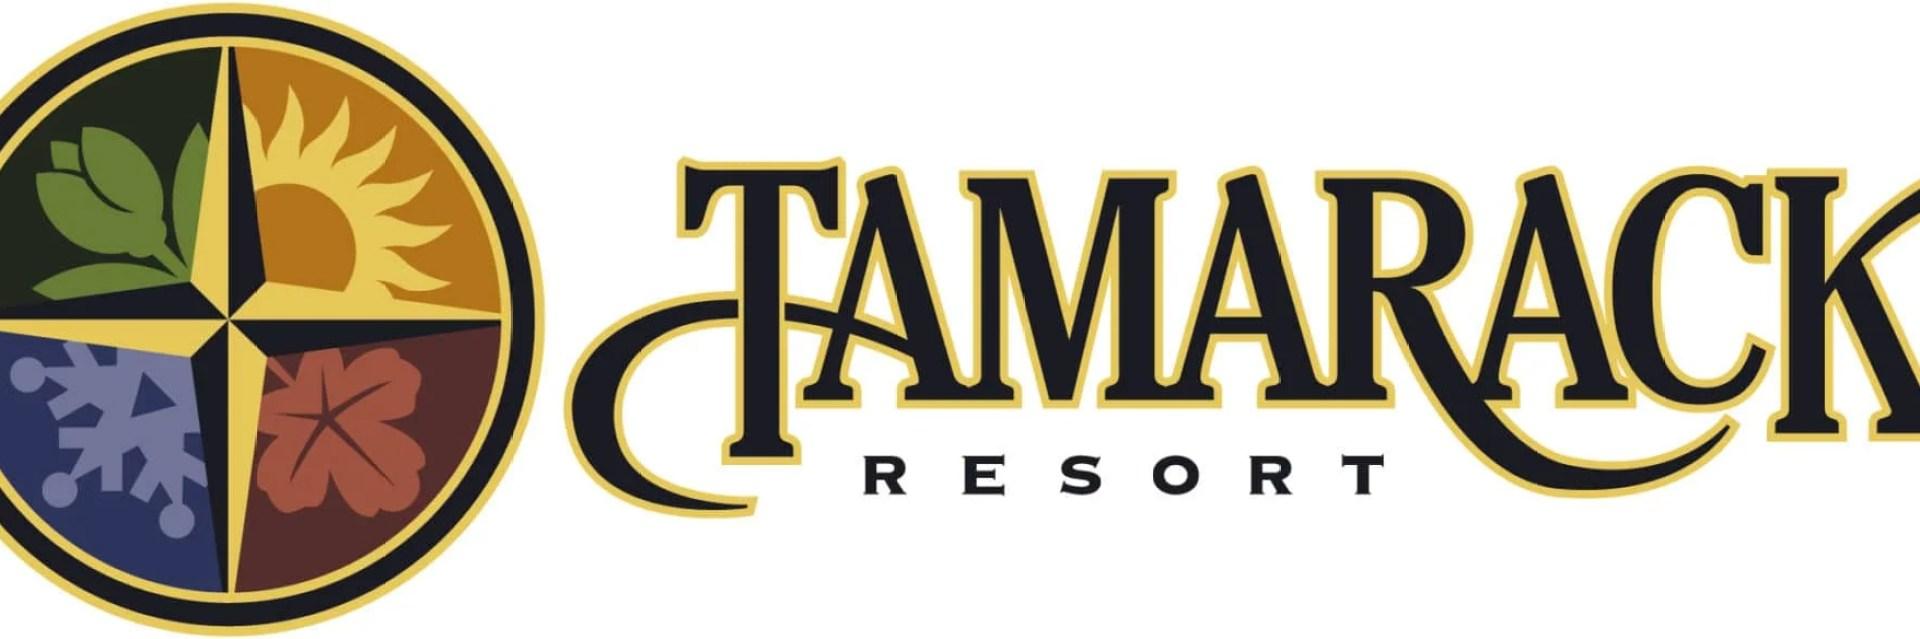 Tamarack Resort Idaho Logo_ MMG Equity Partners